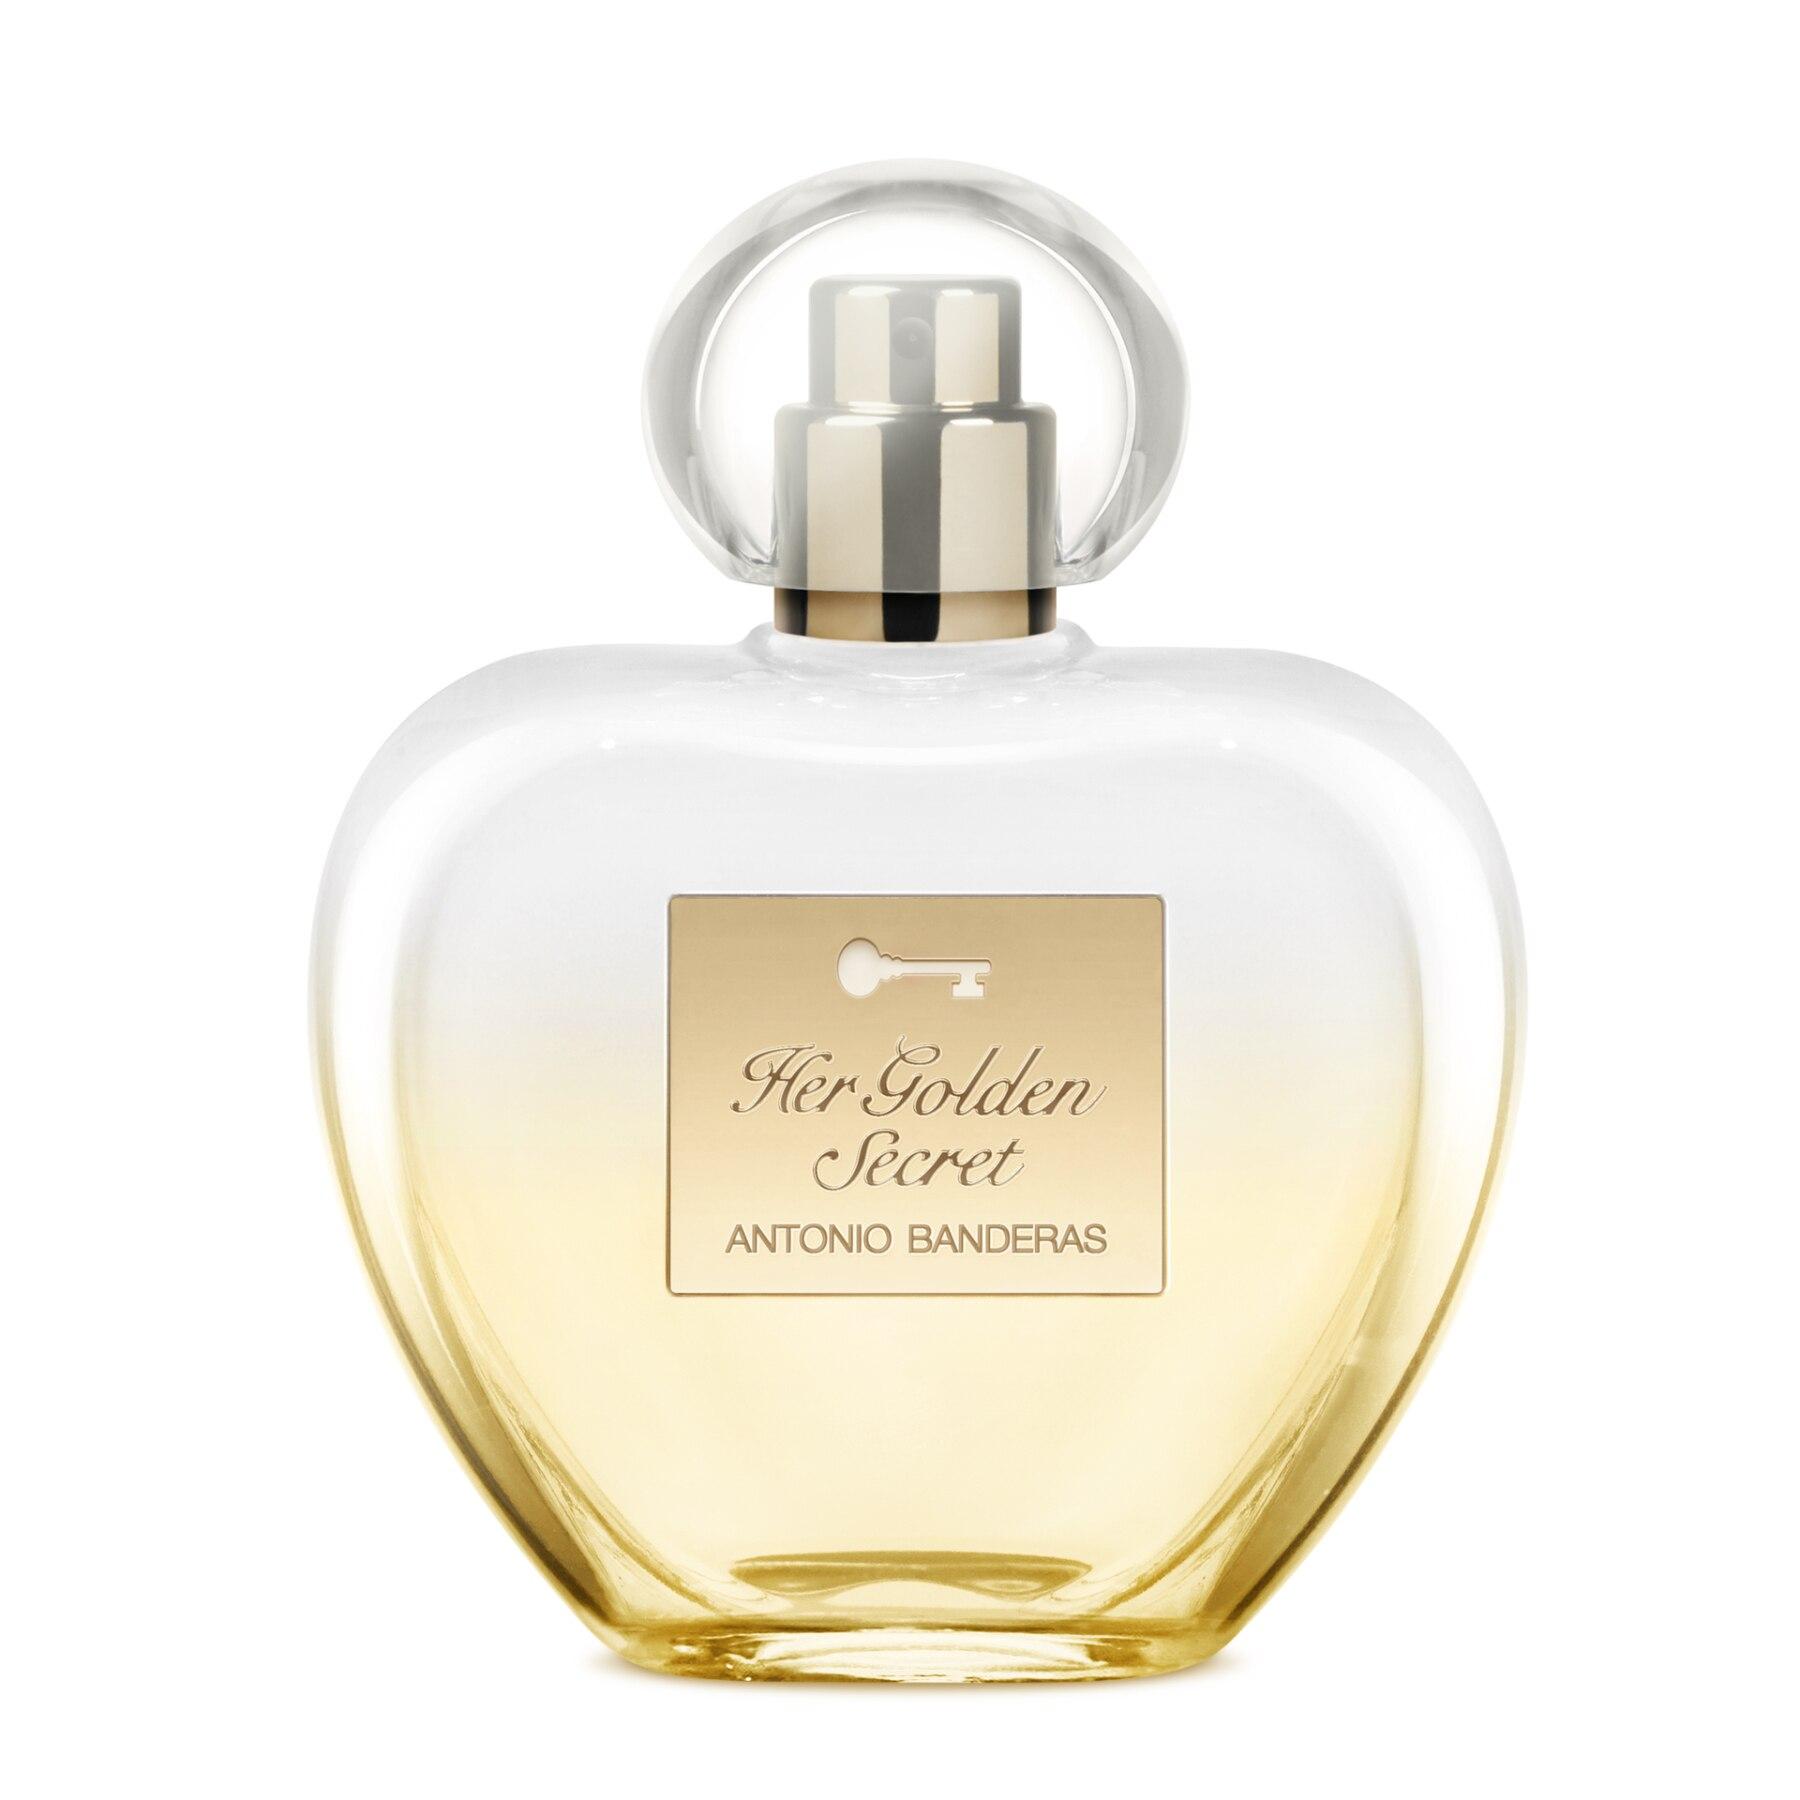 Perfume Antonio Banderas Her Golden Secret Eau De Toilette Perfume 80 Ml Repak